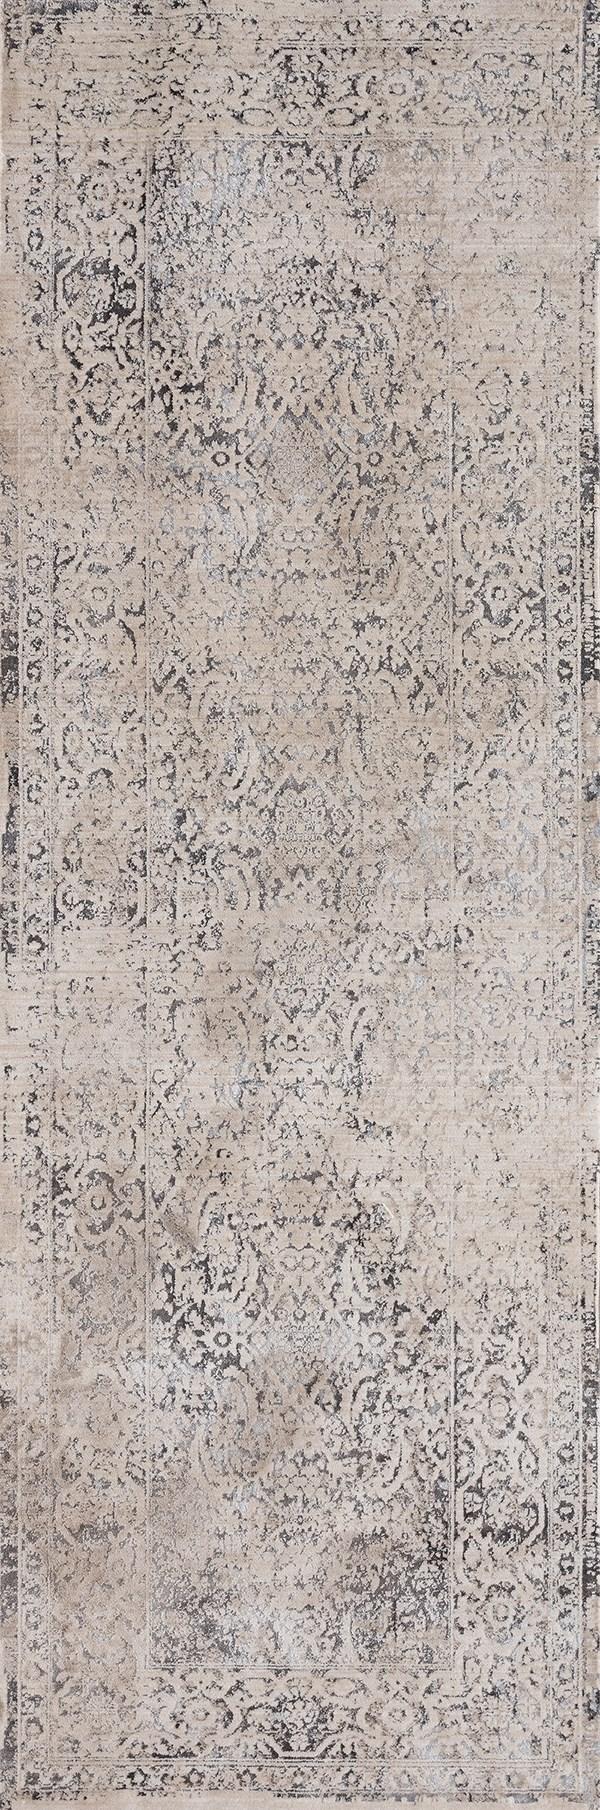 Bone (1805-40901) Vintage / Overdyed Area Rug